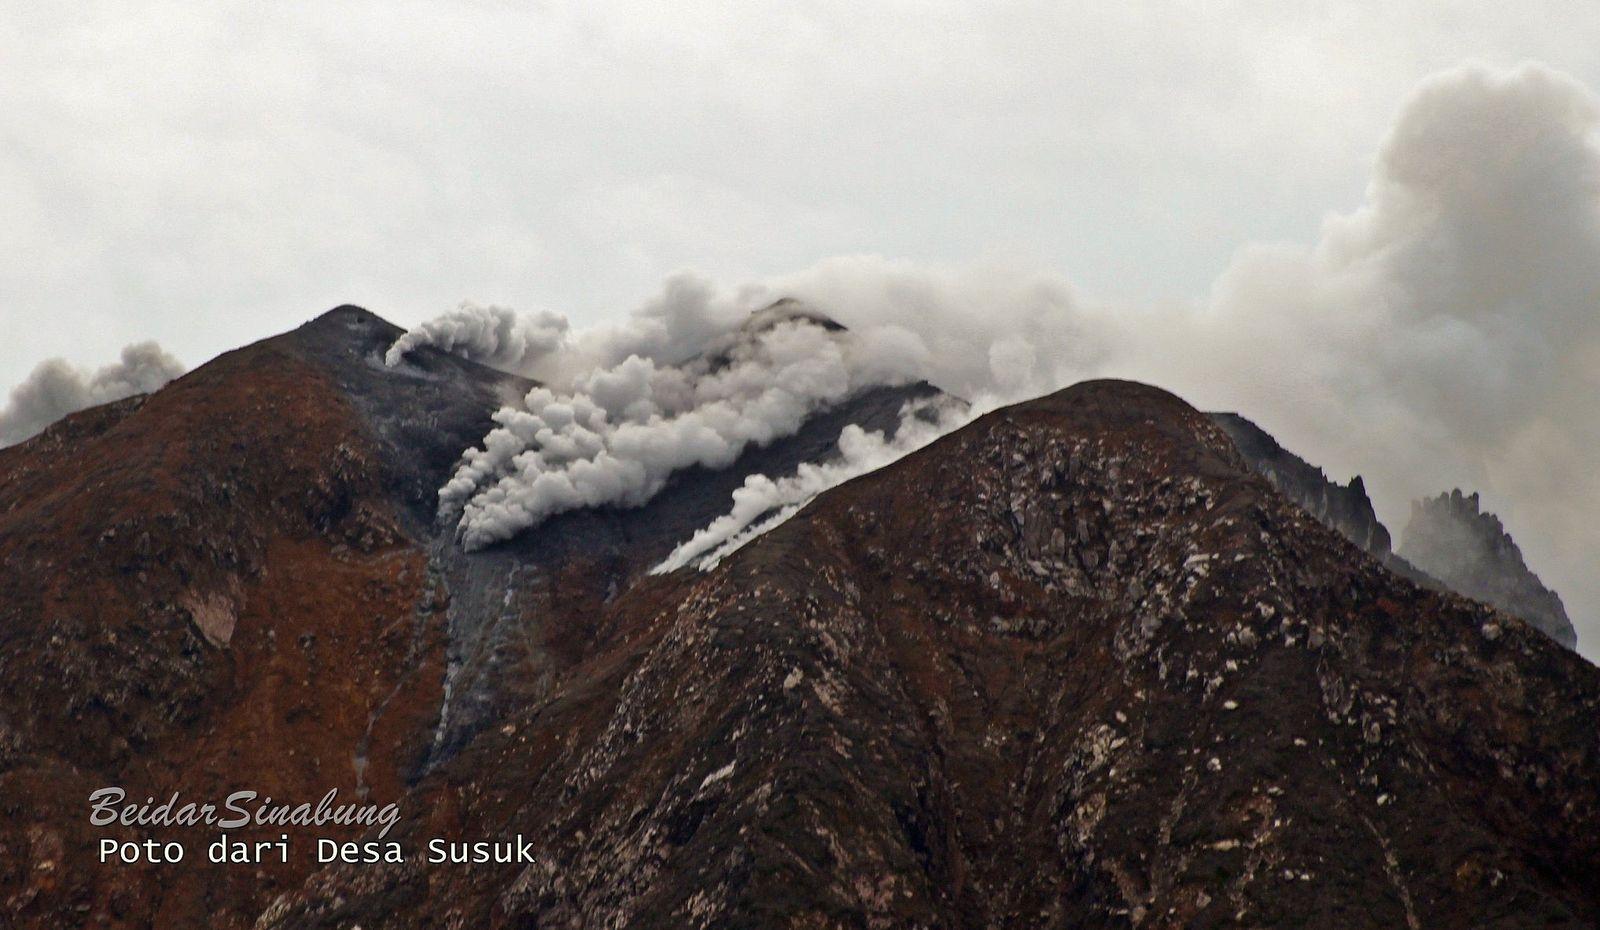 Sinabung - de nombreux évents actifs présentent des fumerolles - photo 11.08.2020 / Firdaus Surbakti / Komunitas Beidar Sinabung